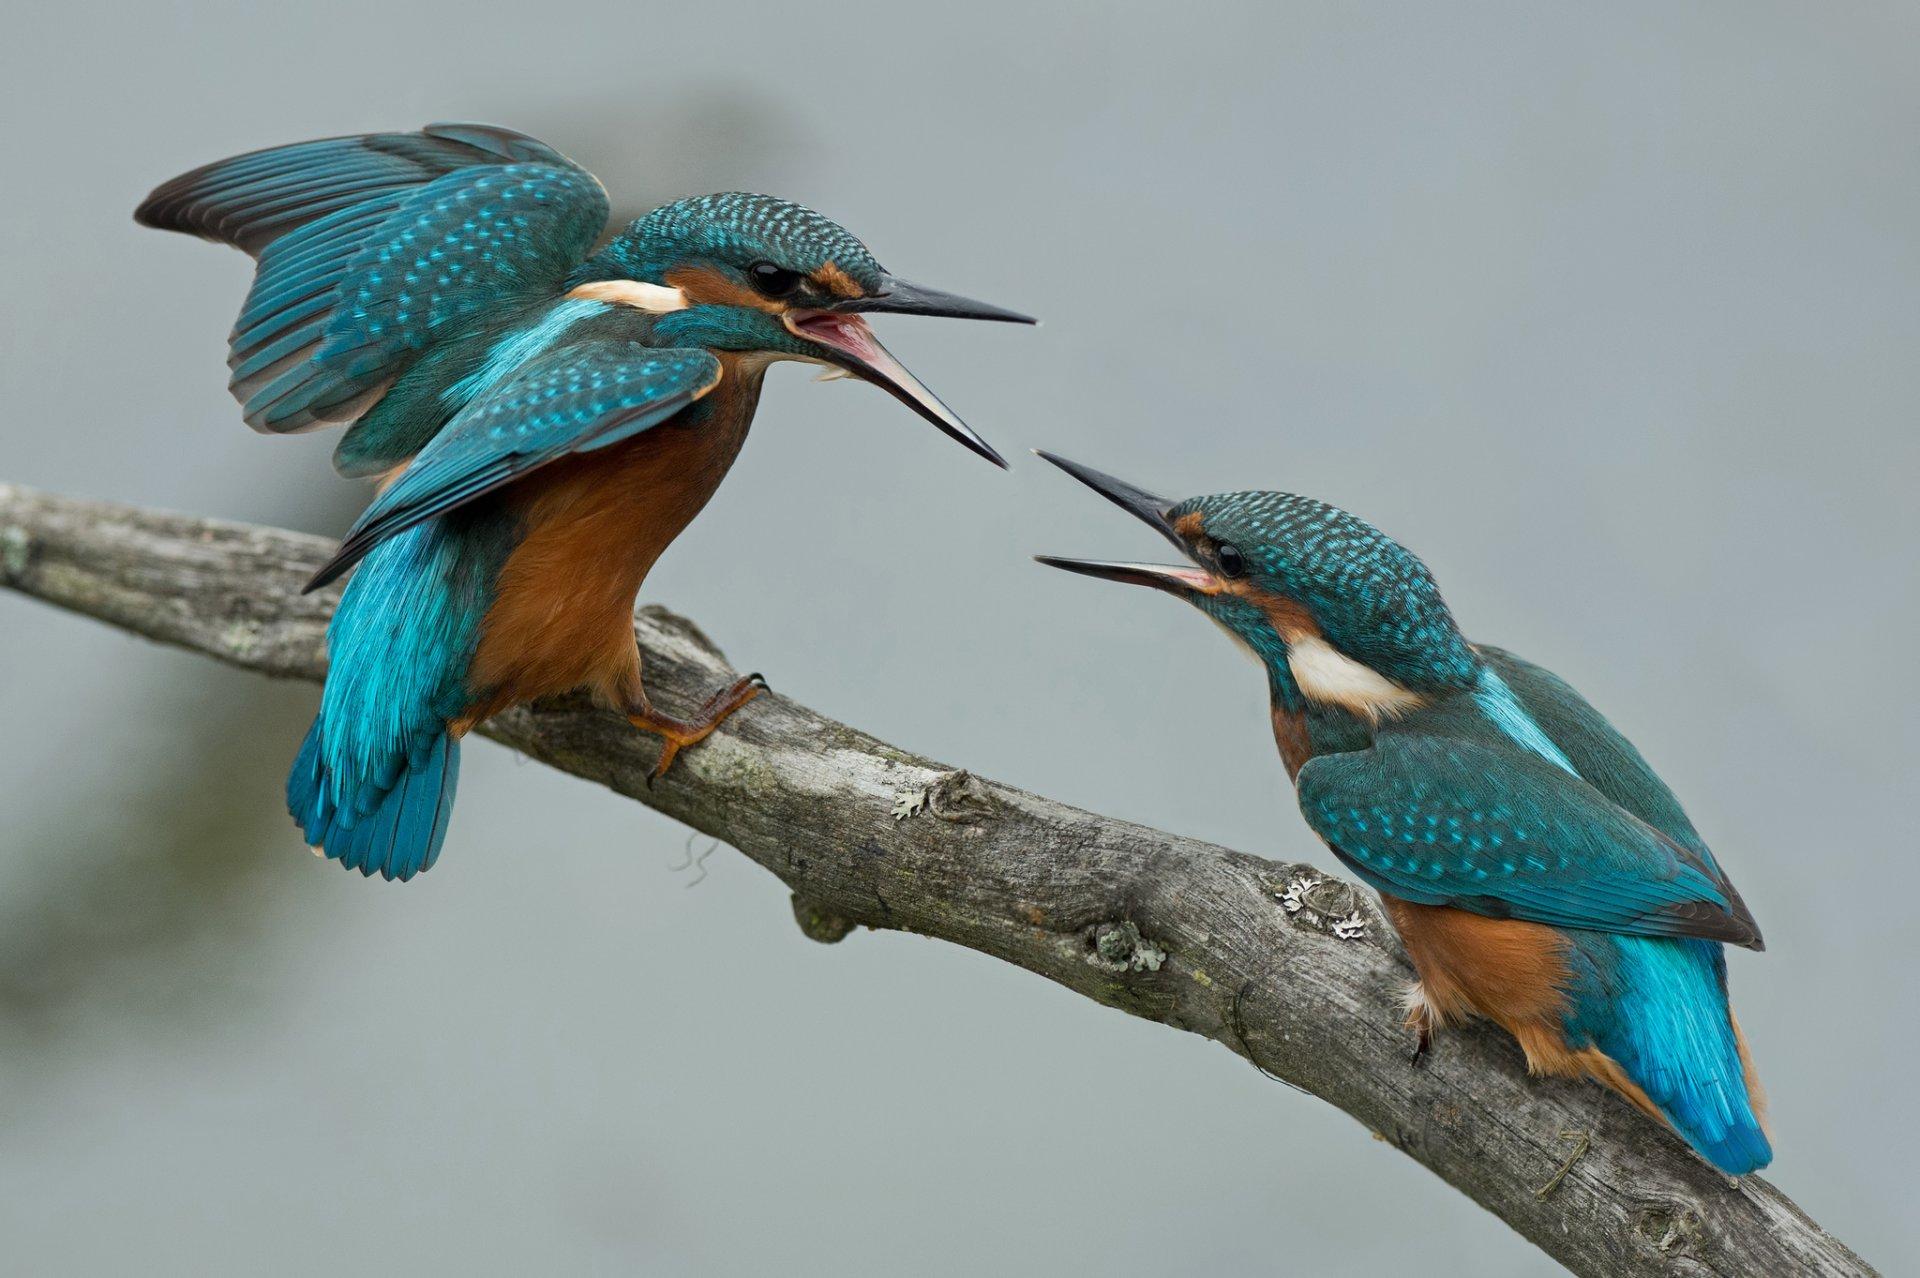 картинка с двумя птицами